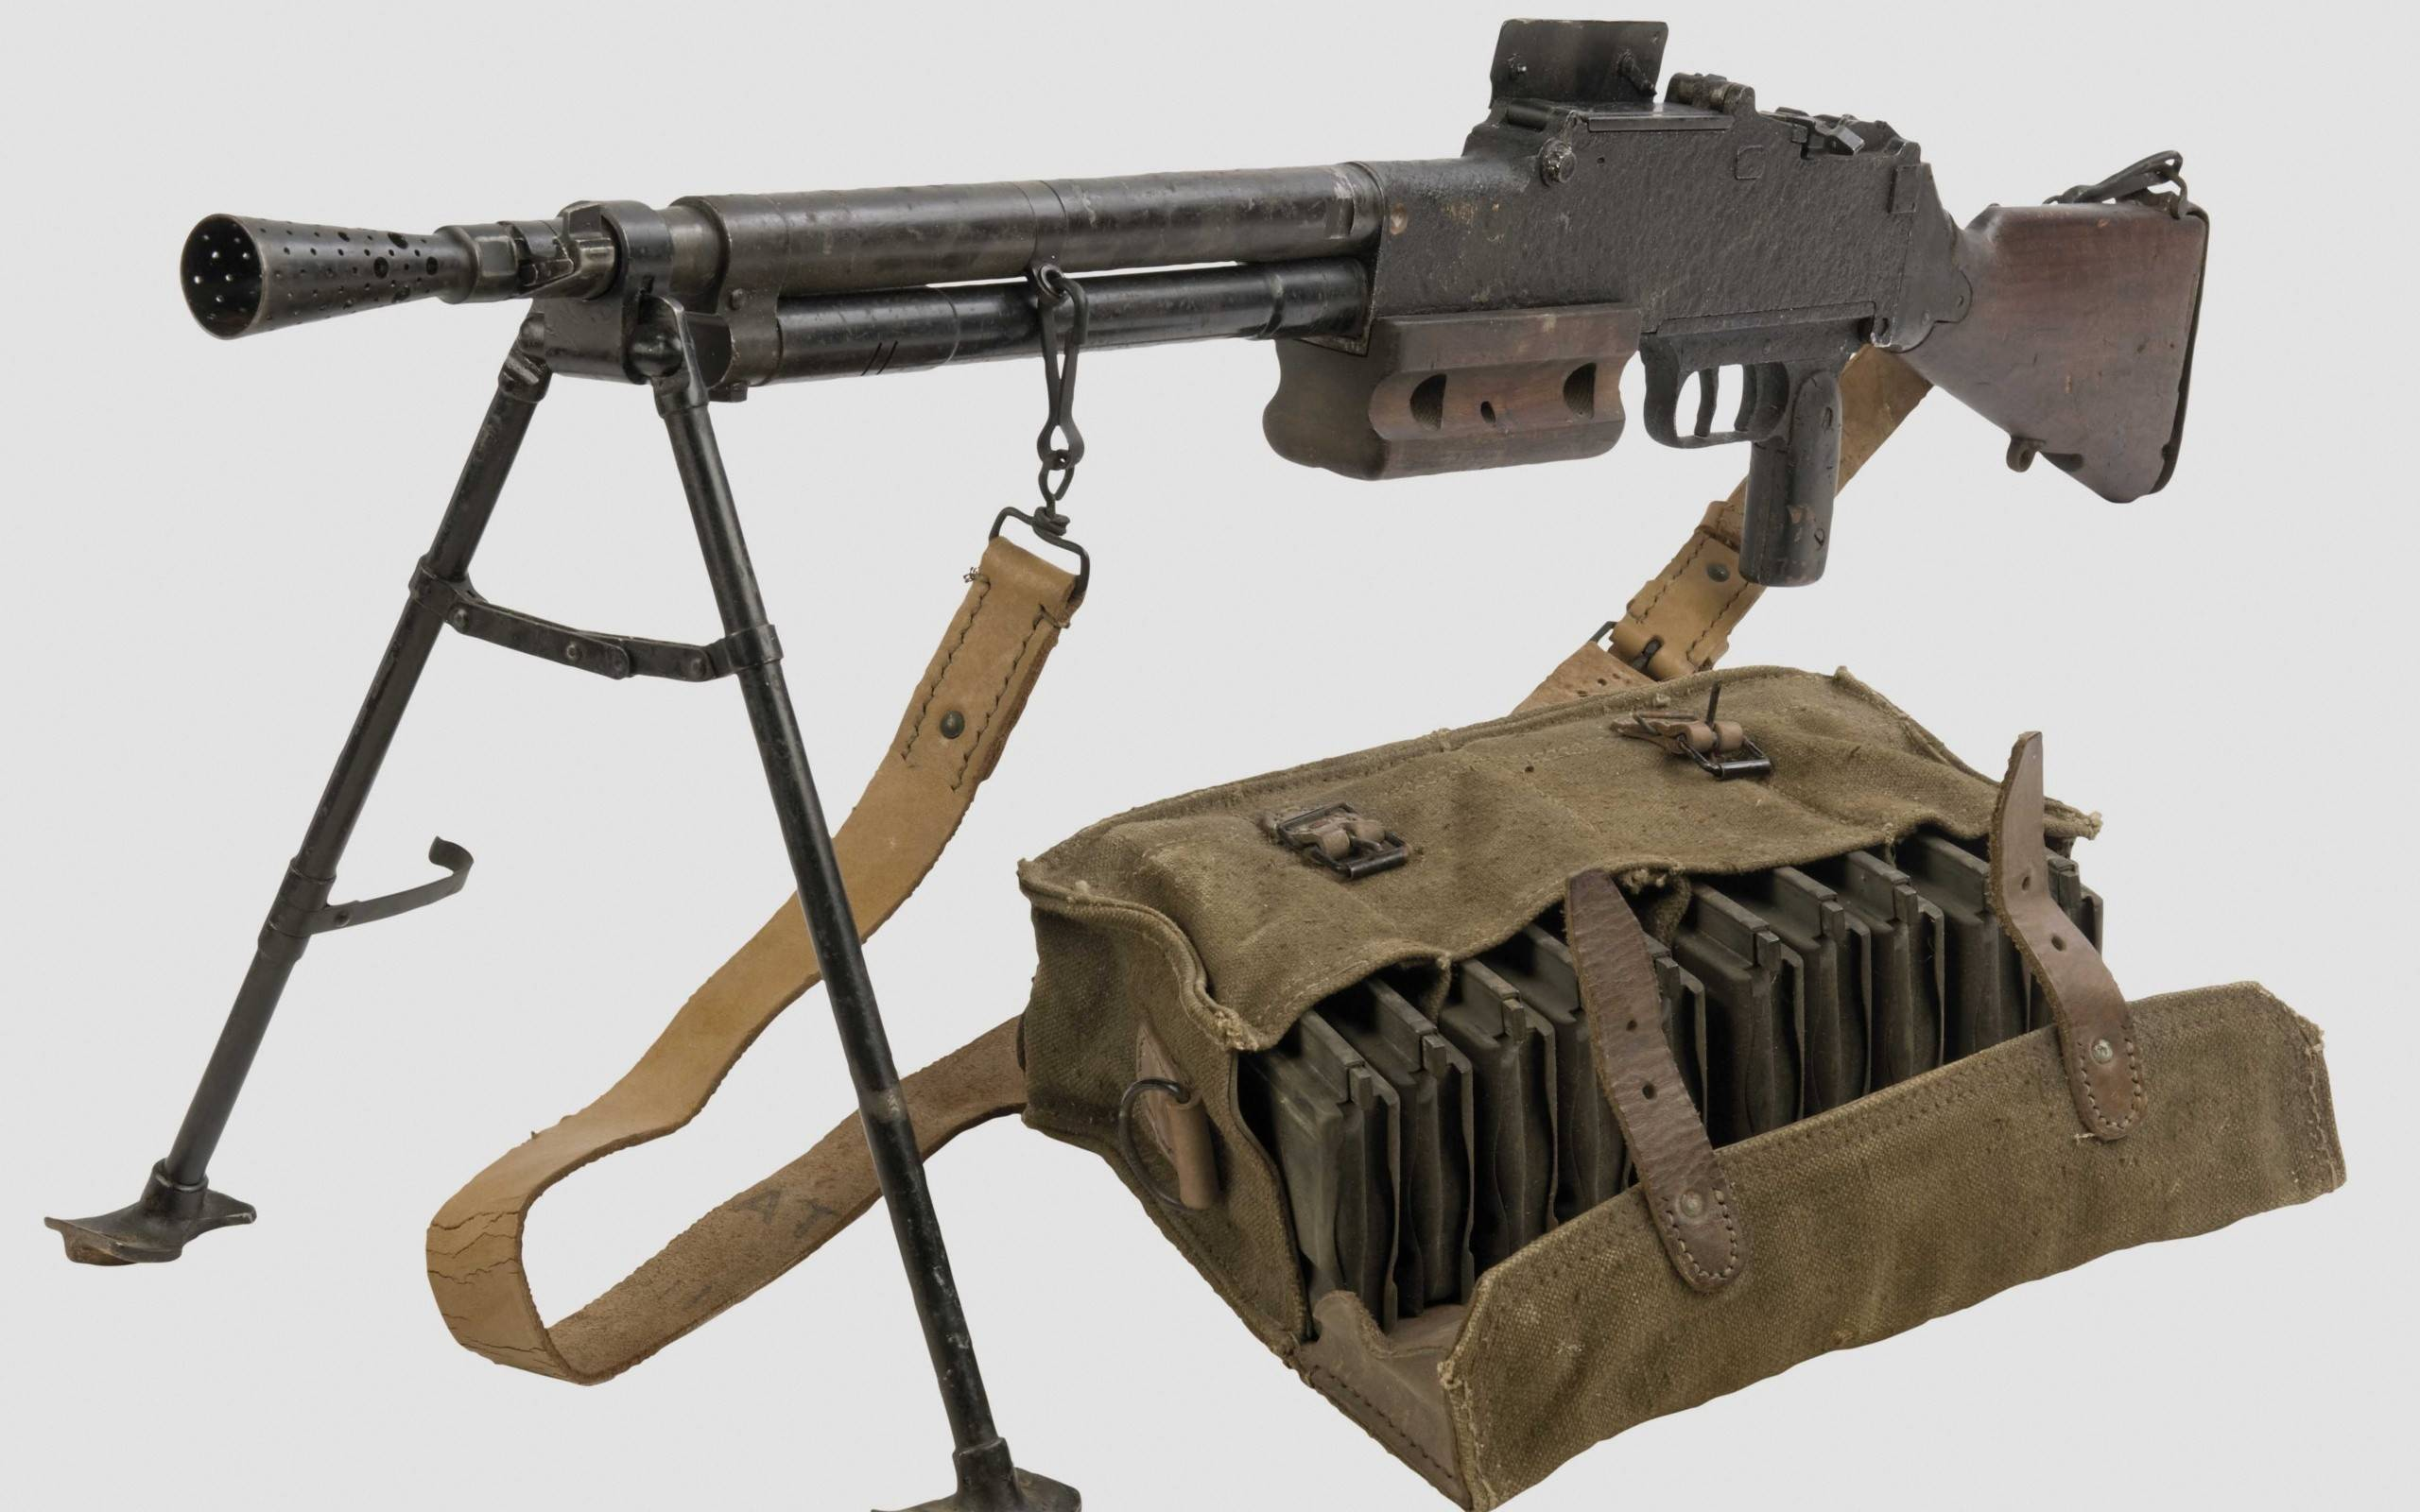 Machine Gun 25601600 Wallpaper 2186107 2560x1600